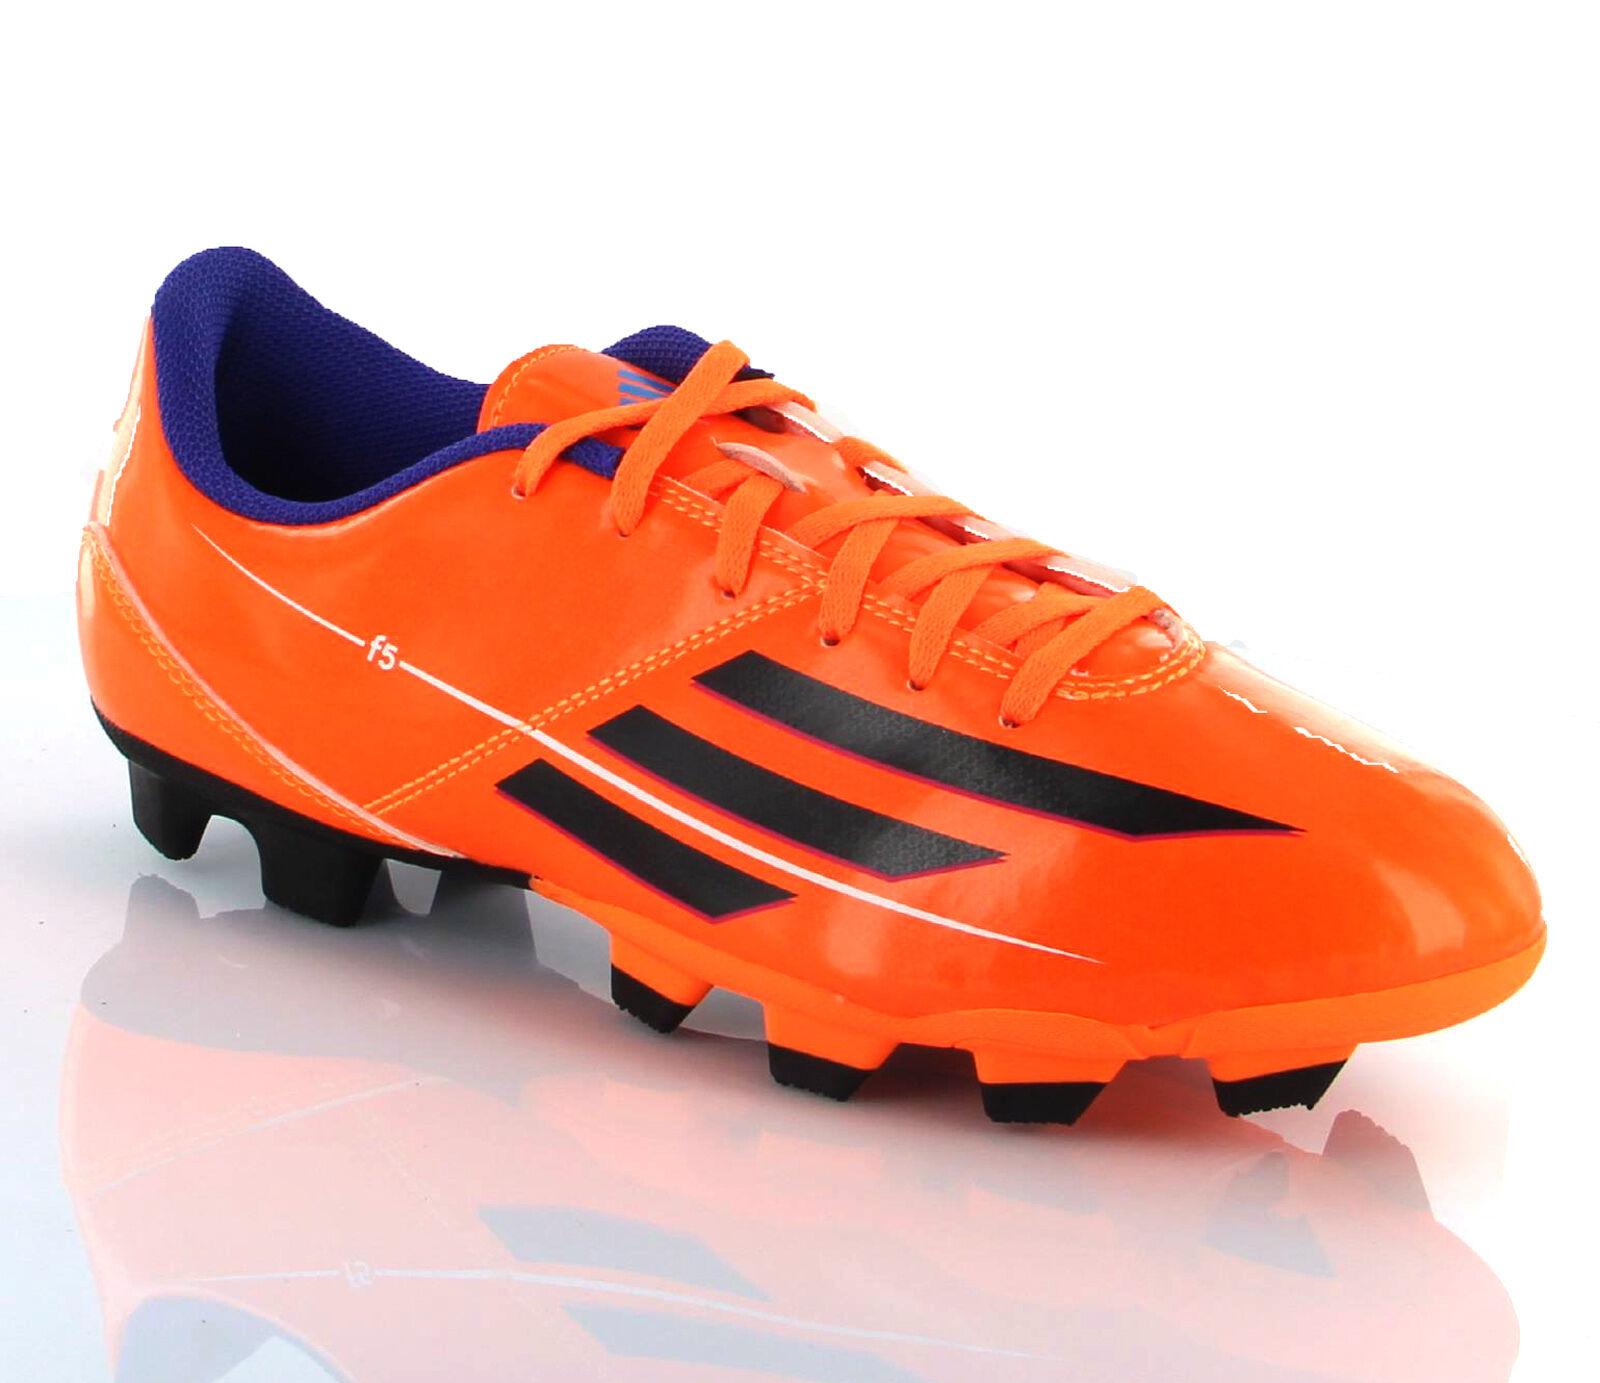 Adidas f5 f5 f5 trx fg arancia performance mens football modellati stalloni calcio stivali | Grande Svendita  bf3abe